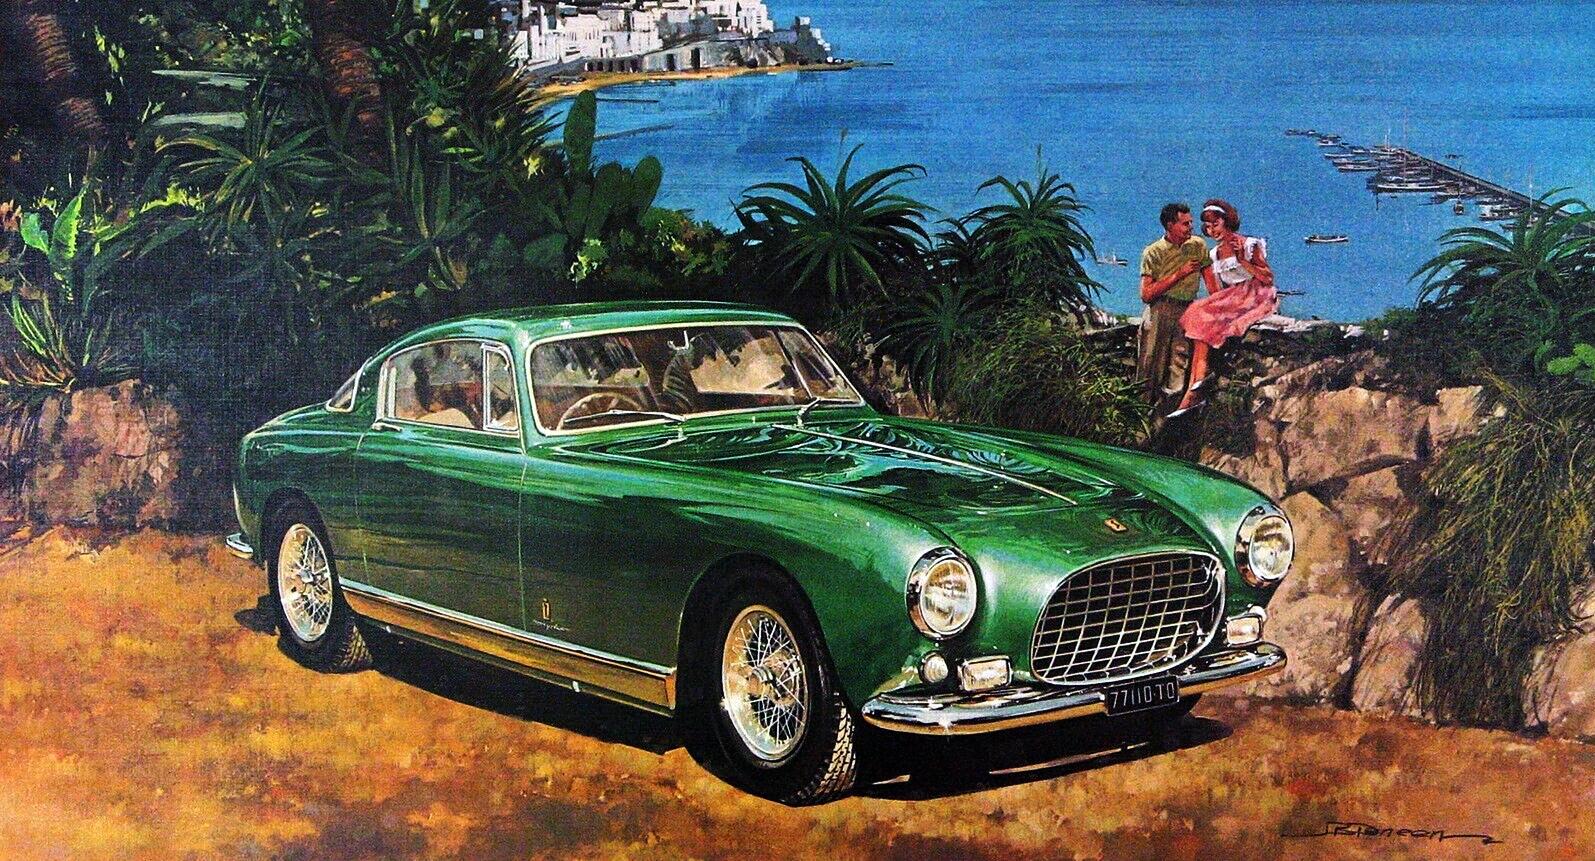 1954. Ferrari 250 Europa. Illustrated by James B. Deneen